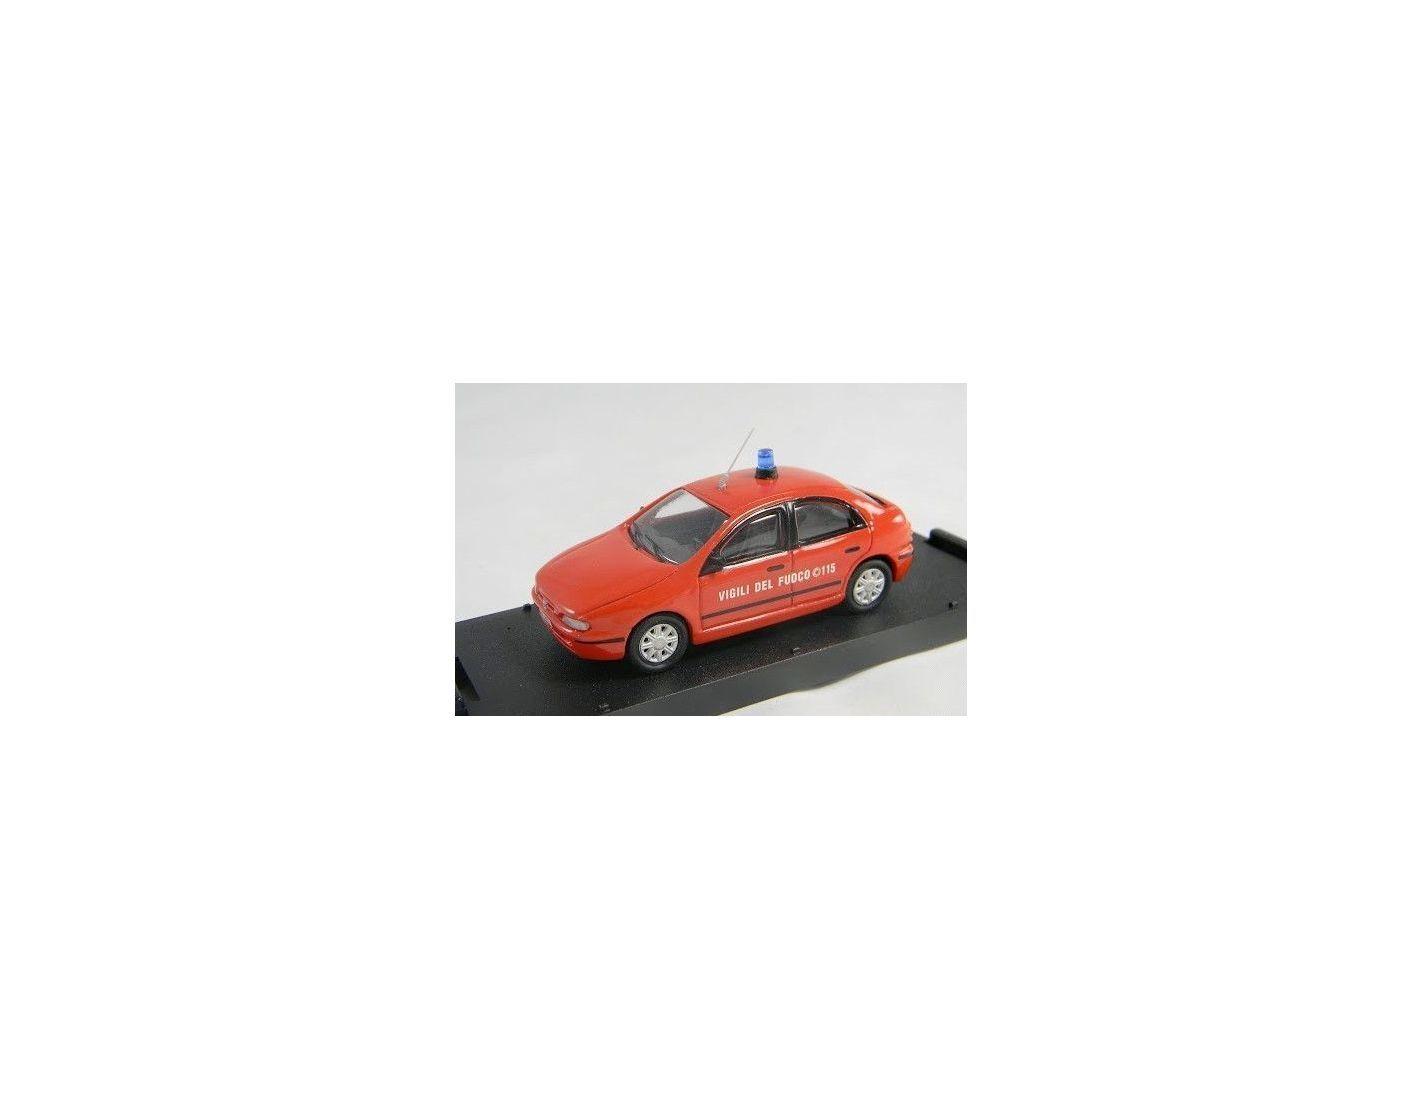 Giocher BRVDF FIAT BRAVA STR. VIGILI DEL FUOCO 1 4 Modellino